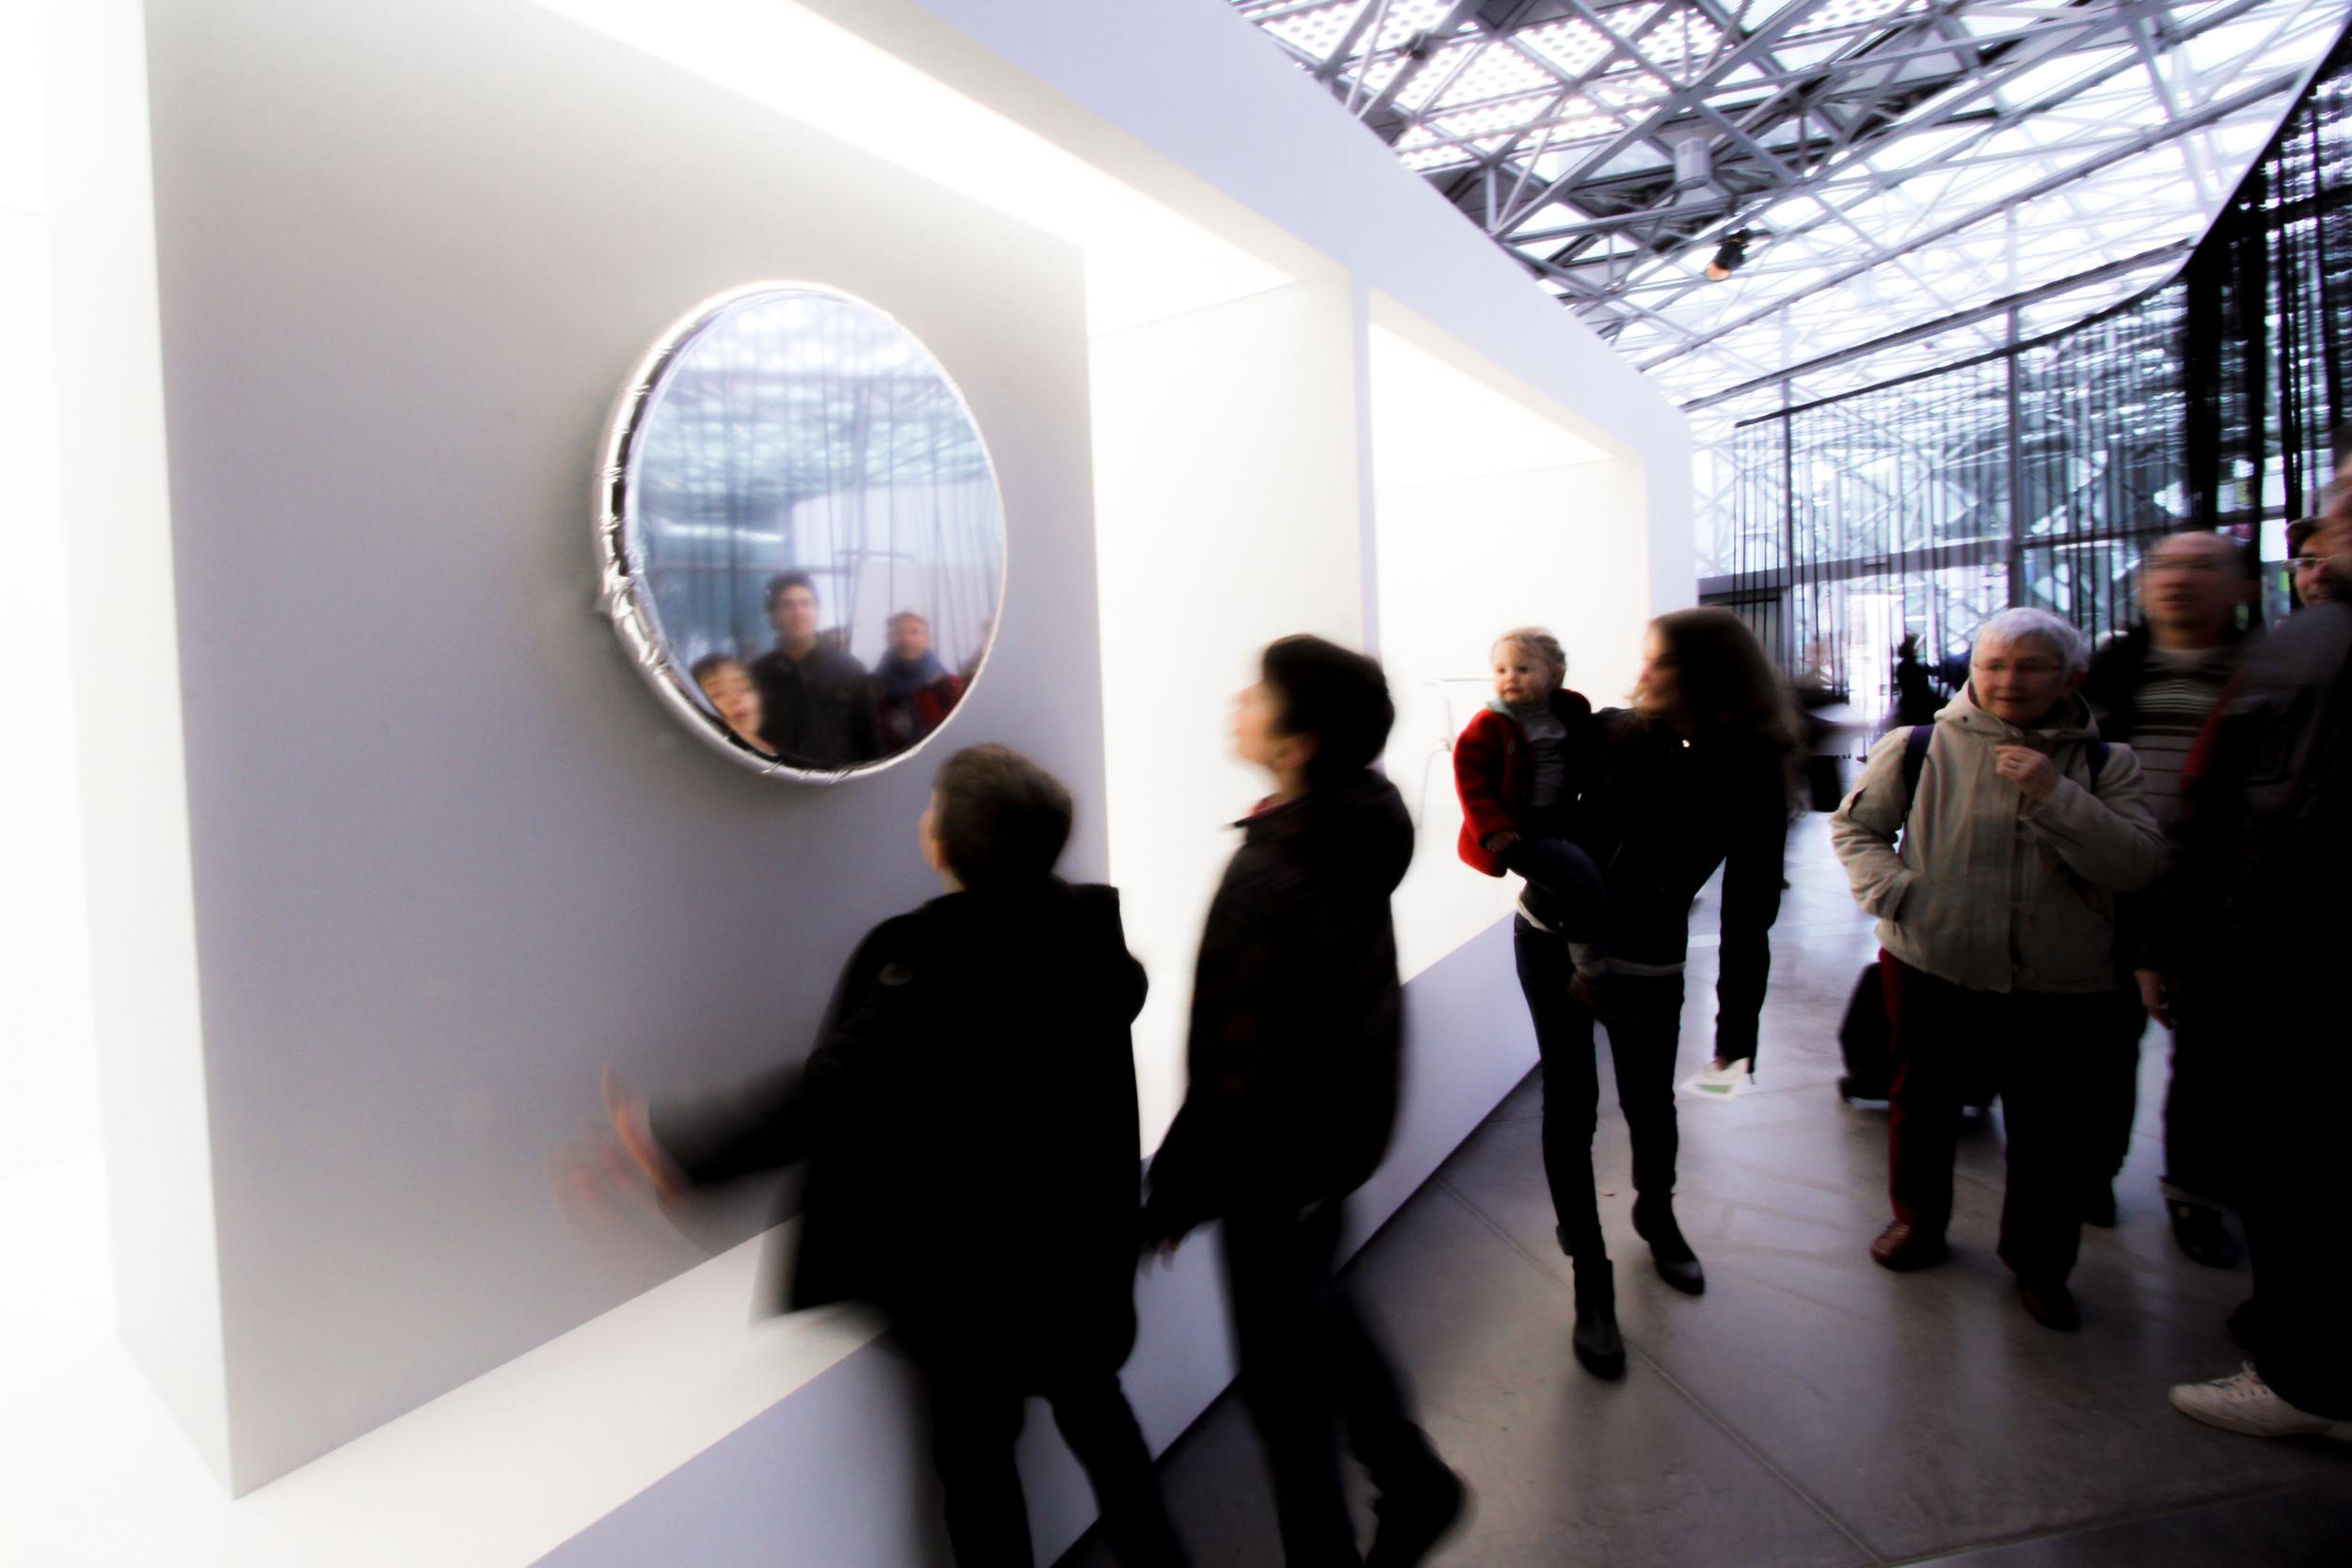 Futurecrafter_BiennaleSaintEtienne (24 of 35).jpg